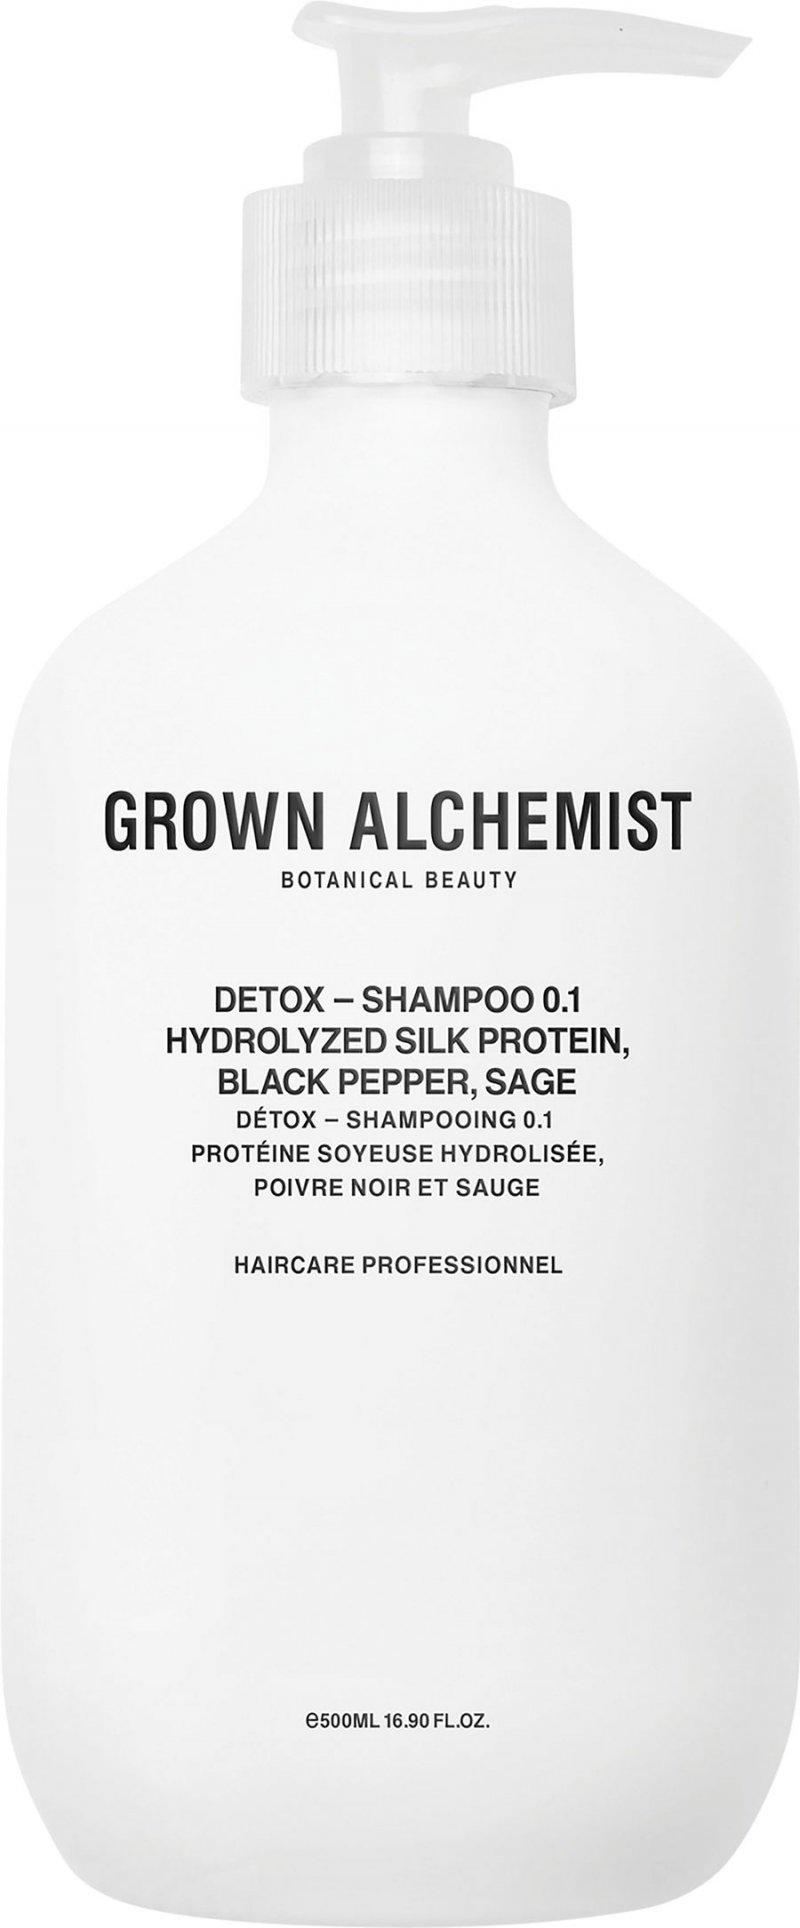 Image of   Grown Alchemist Shampoo - Detox 0.1 Hydrolized Sil Protein, Black Pepper, Sage